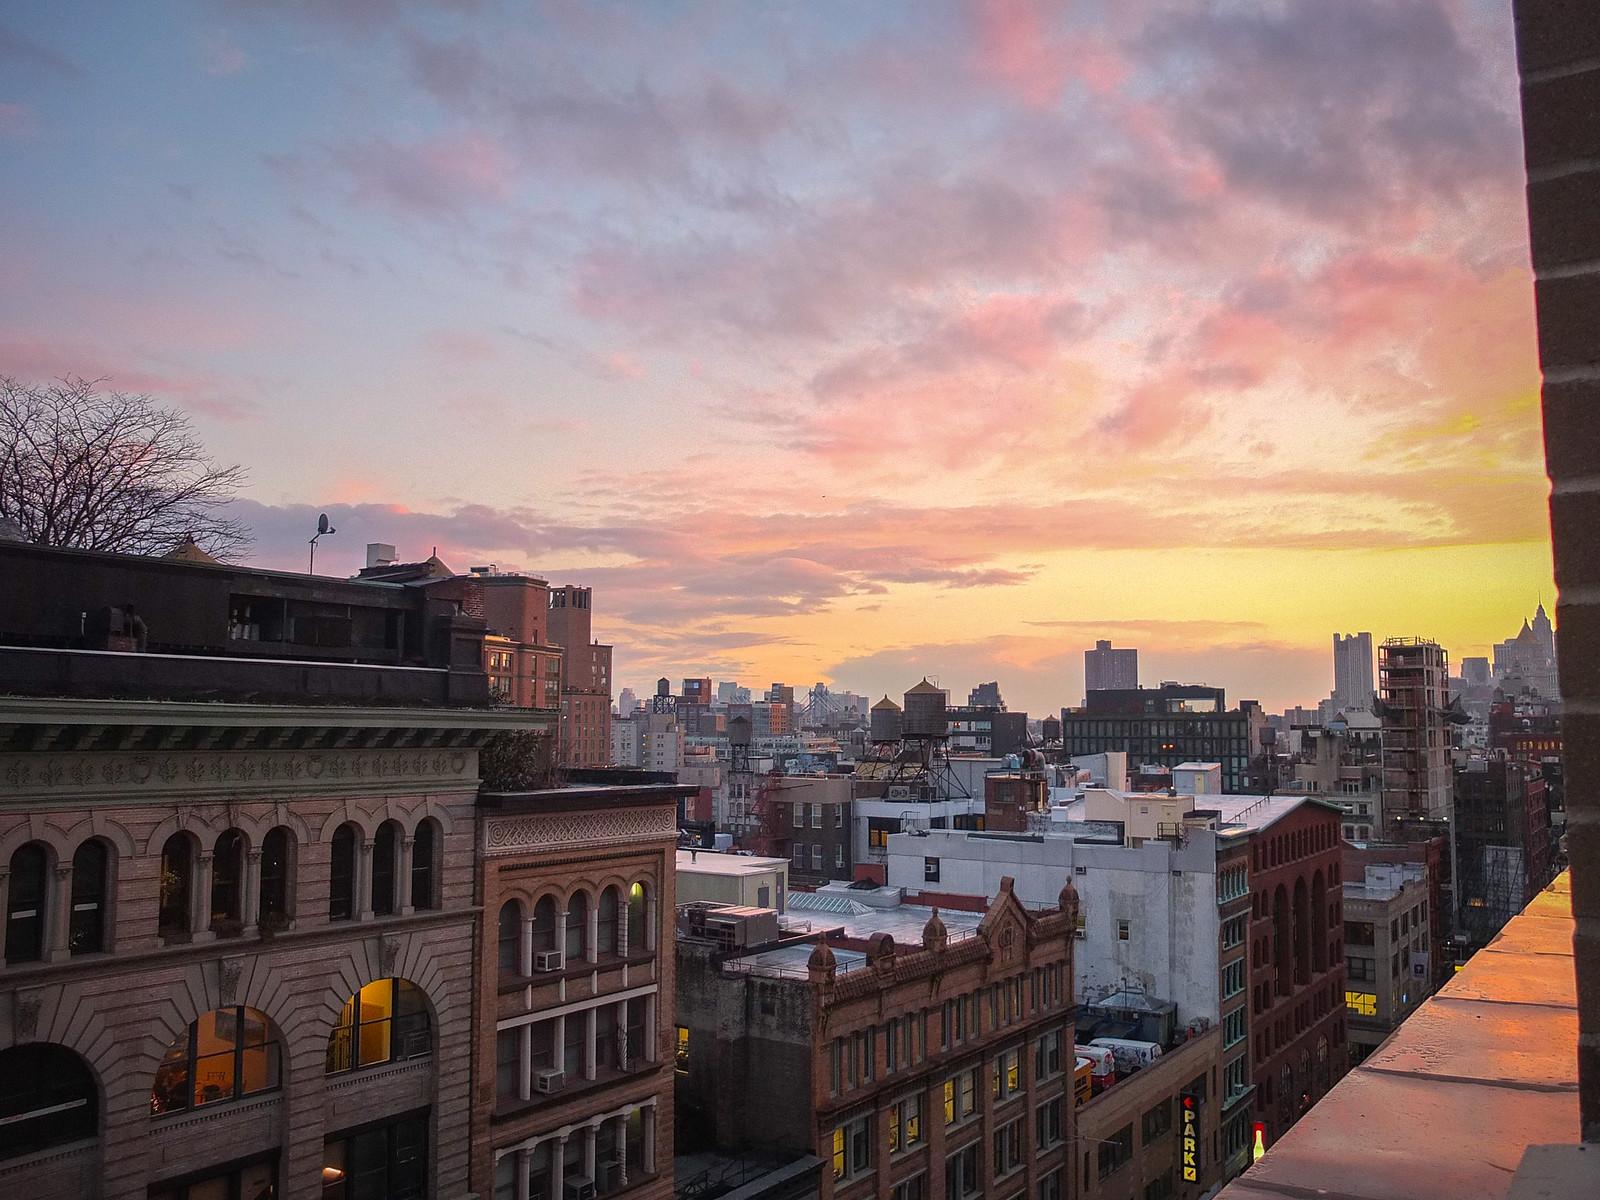 Sunset is around the corner... by wwward0